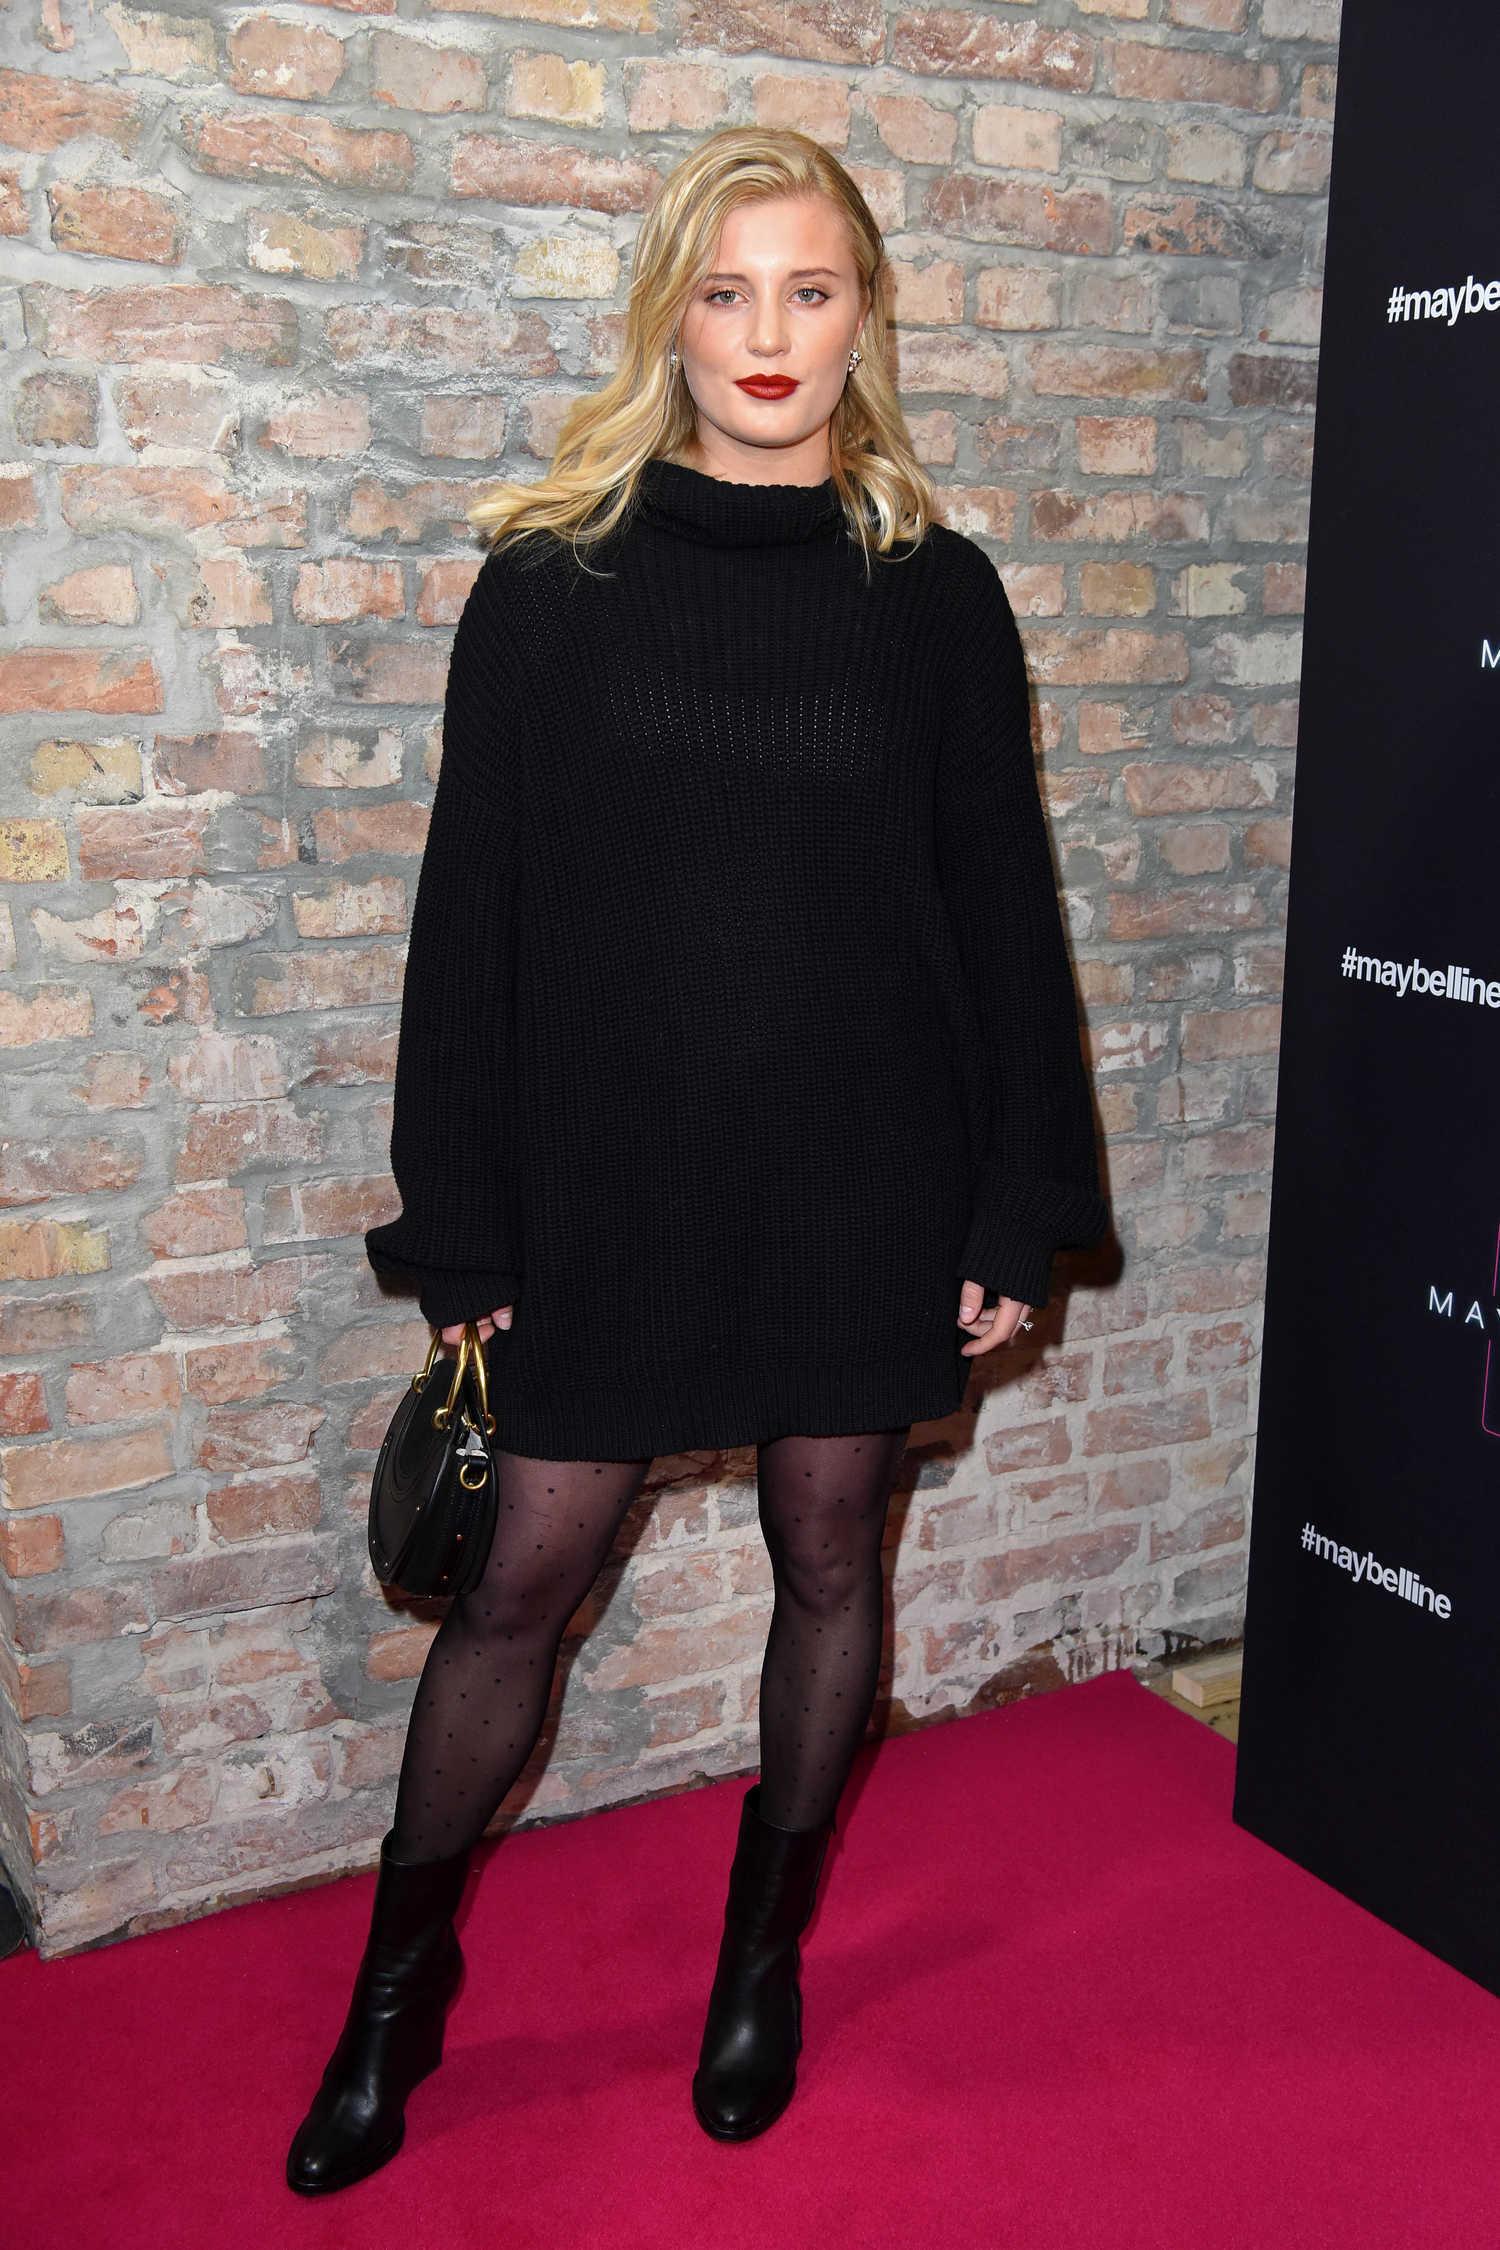 Luna Schweiger Attends Maybelline Fashion Show During The